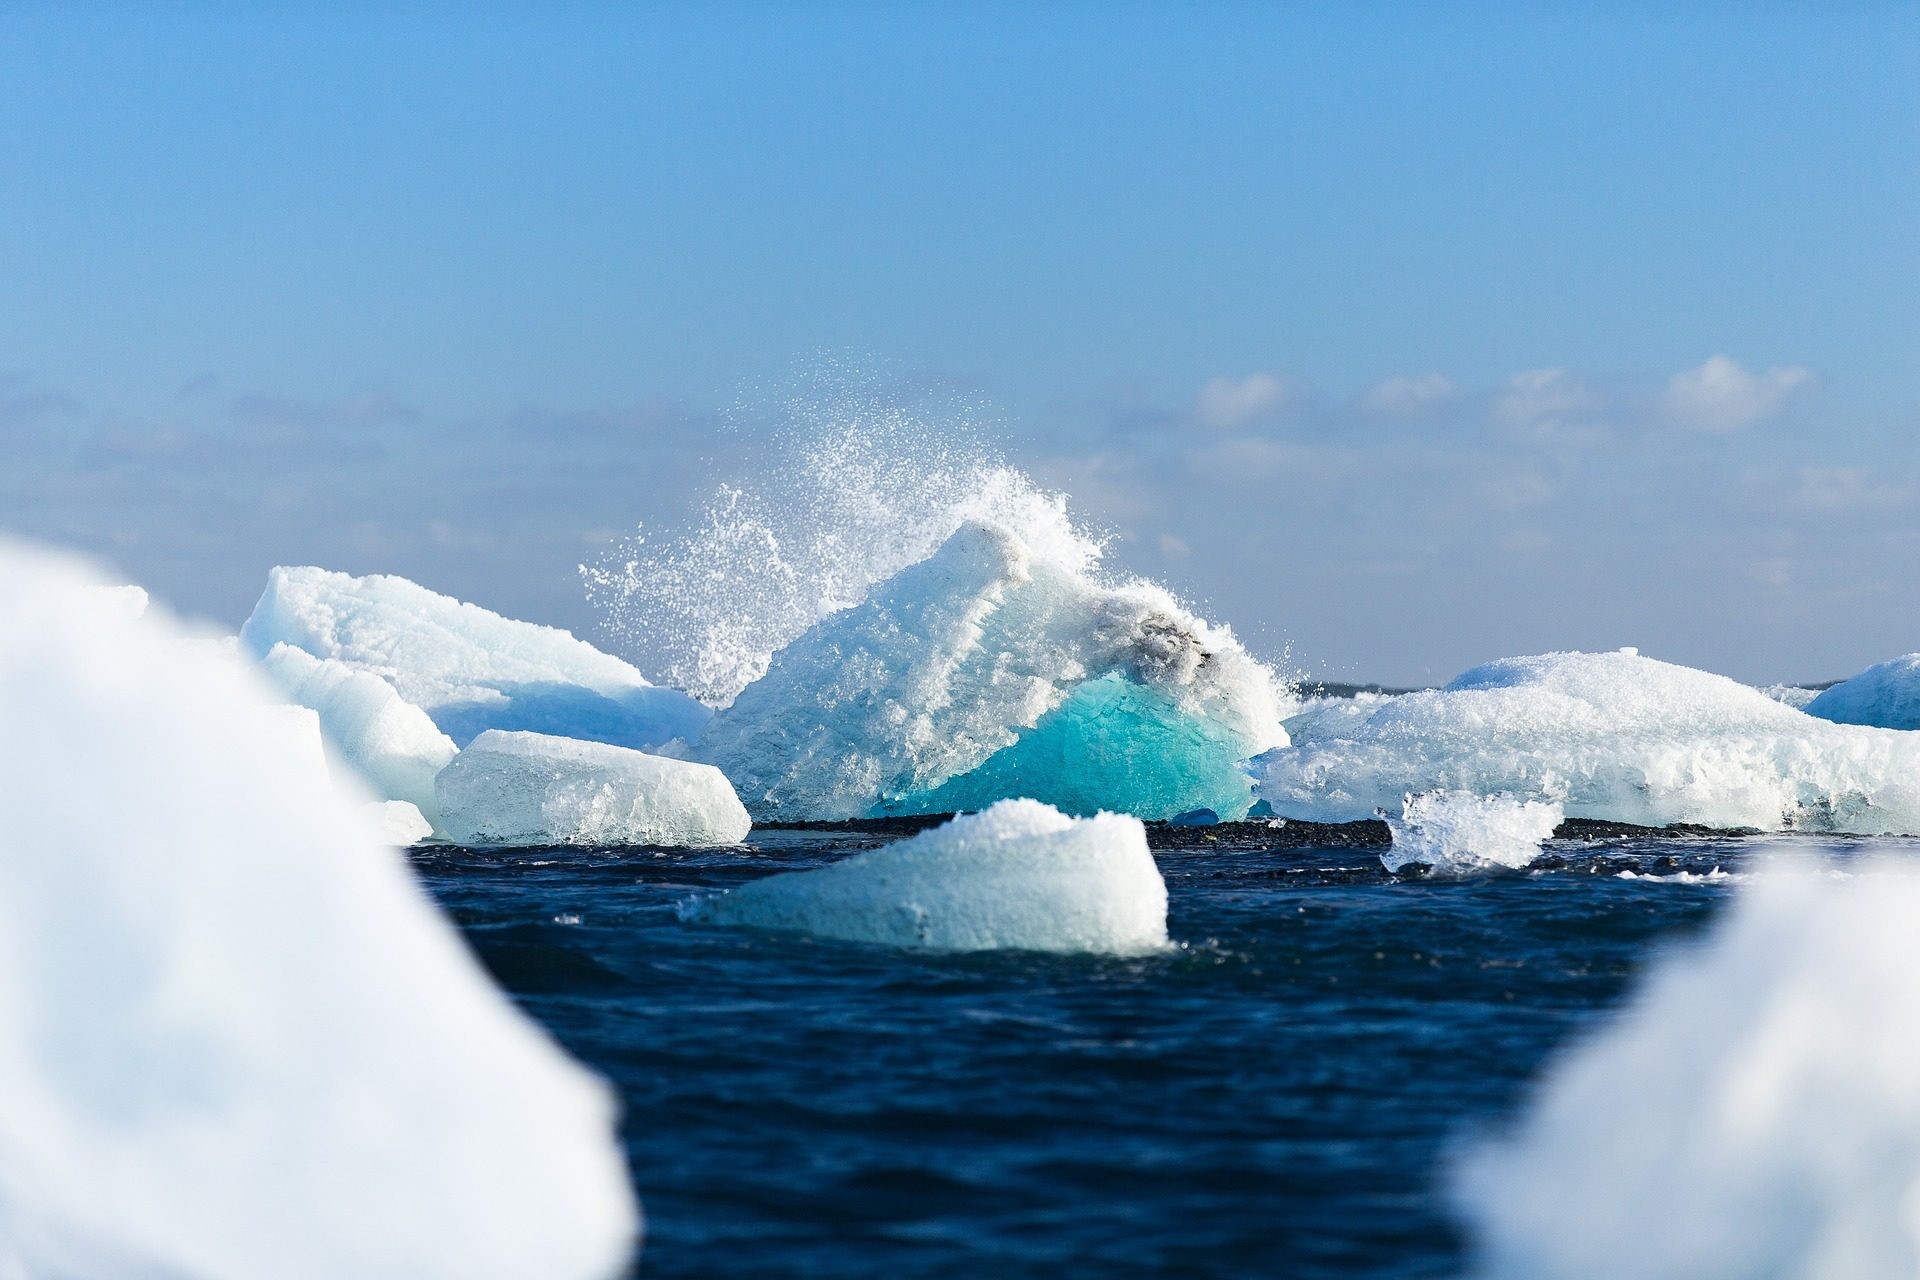 jean jouzel au miramar glacier